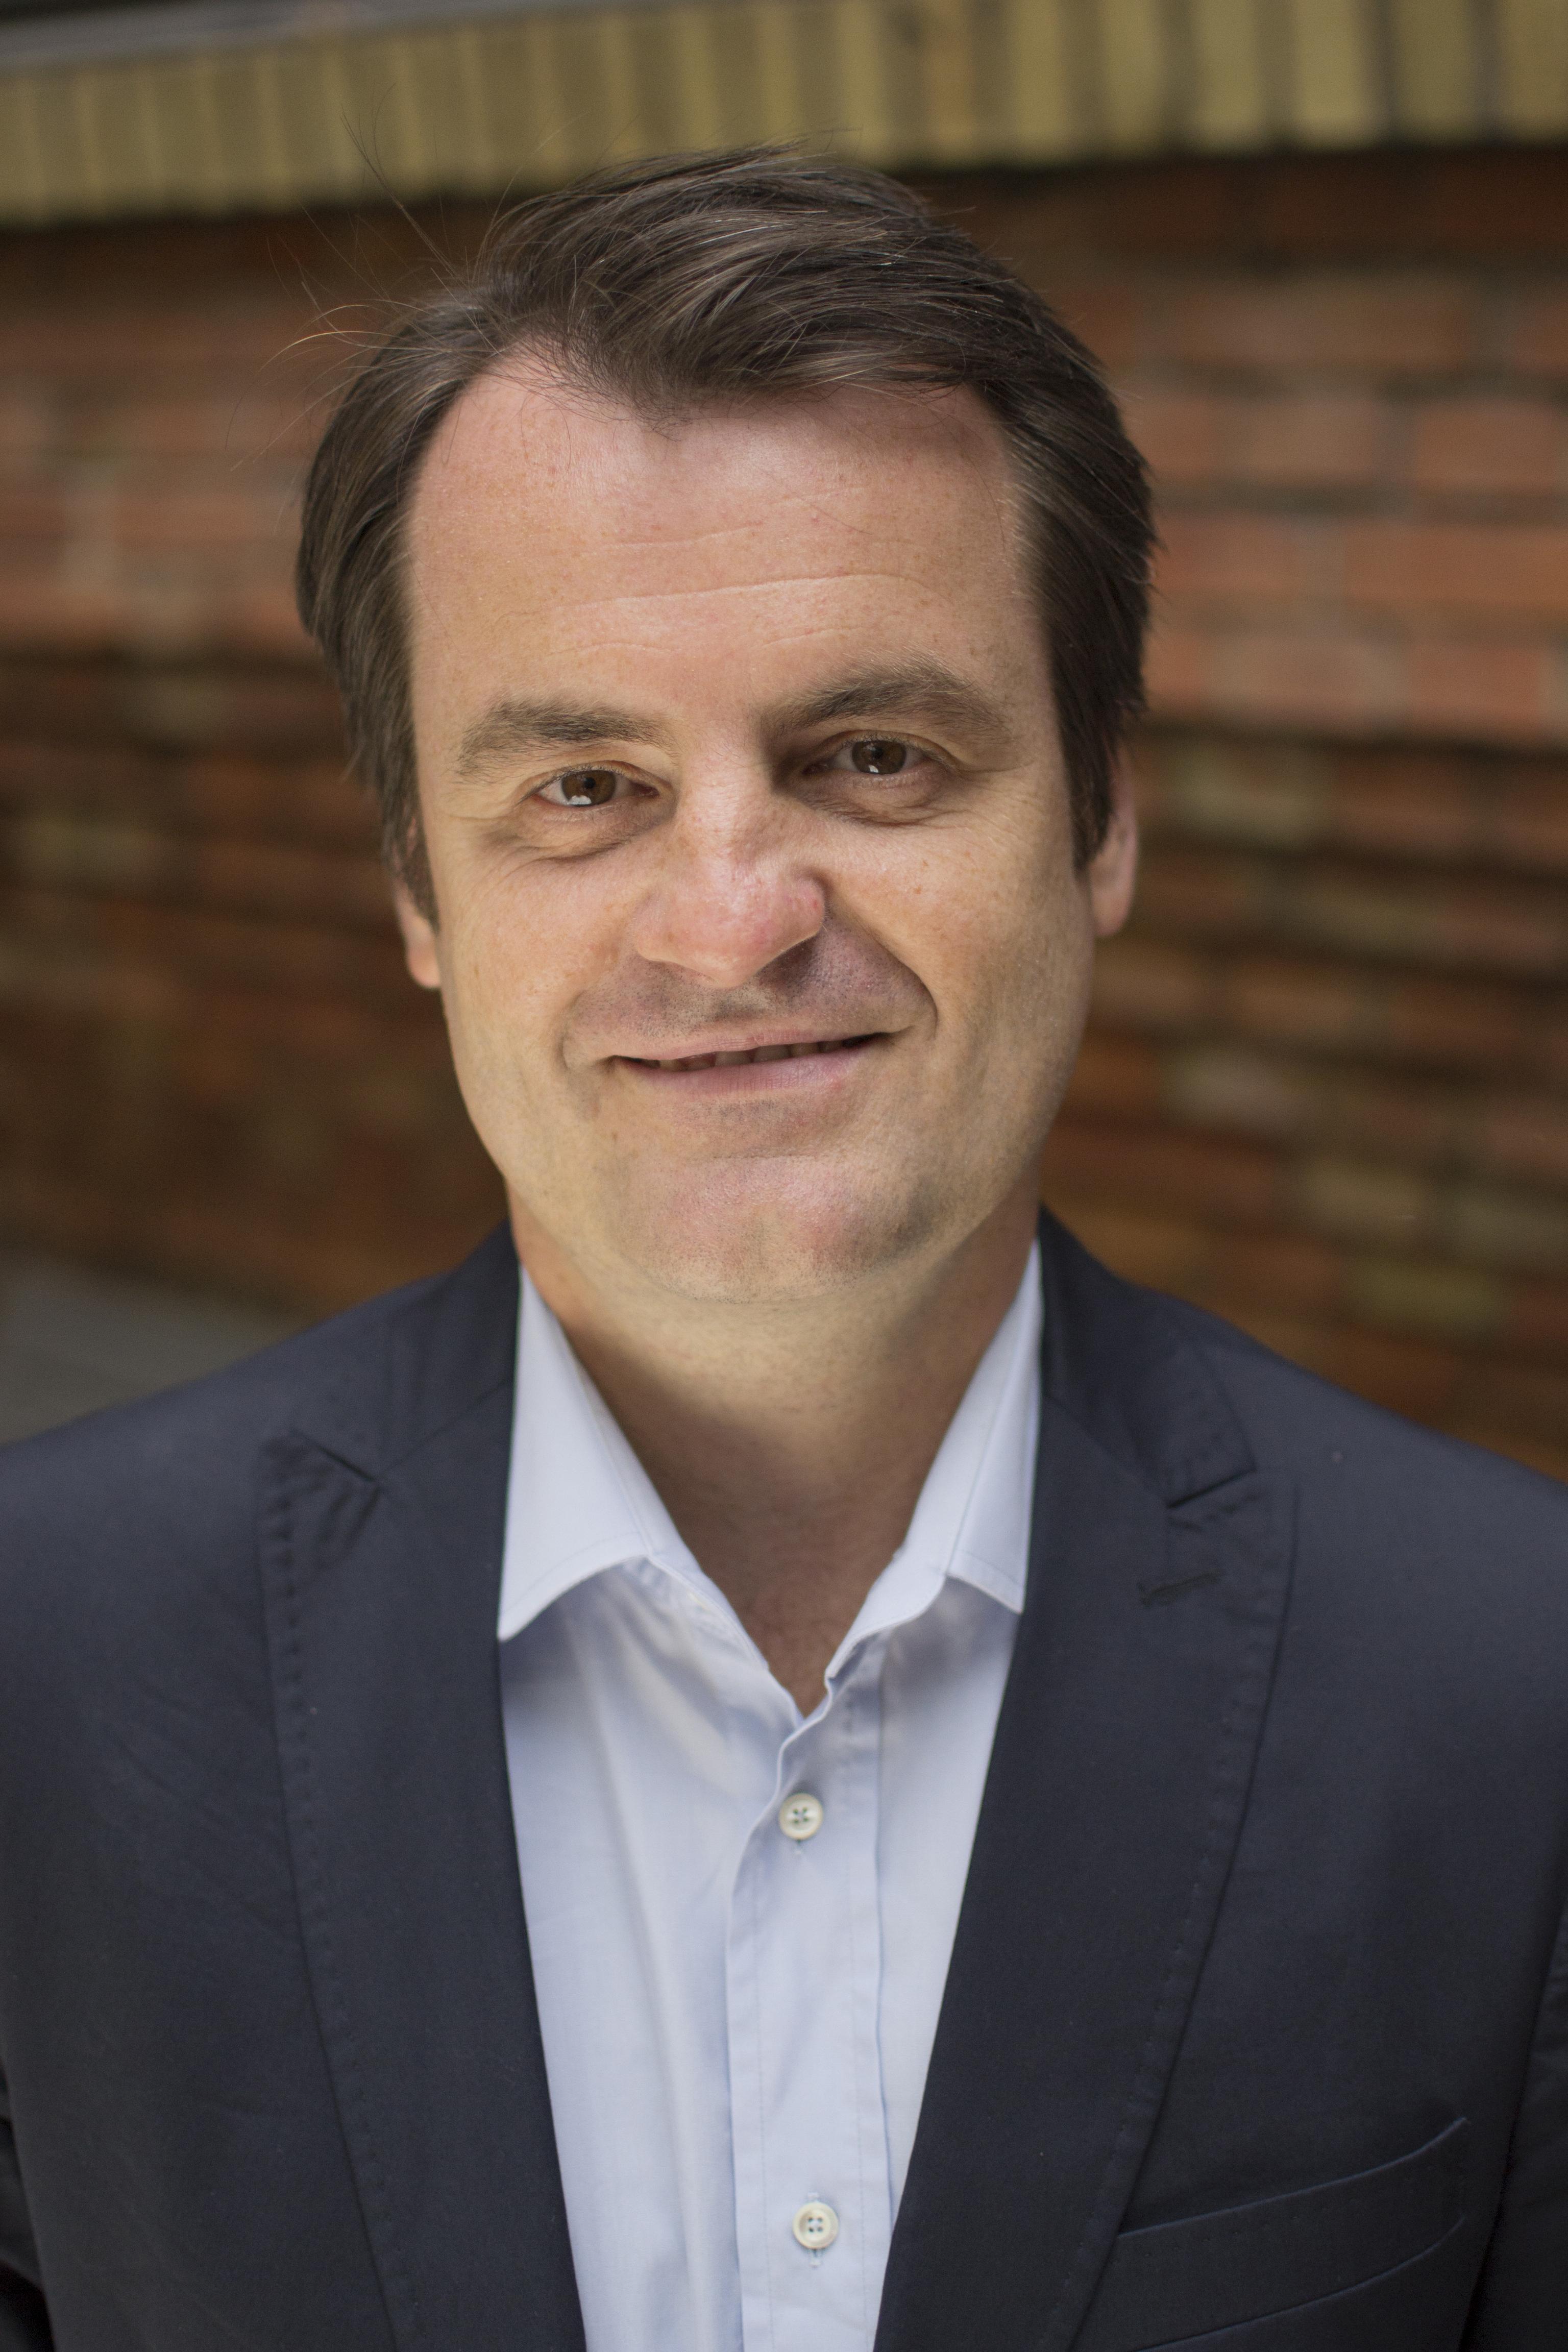 Christian Lüdtke